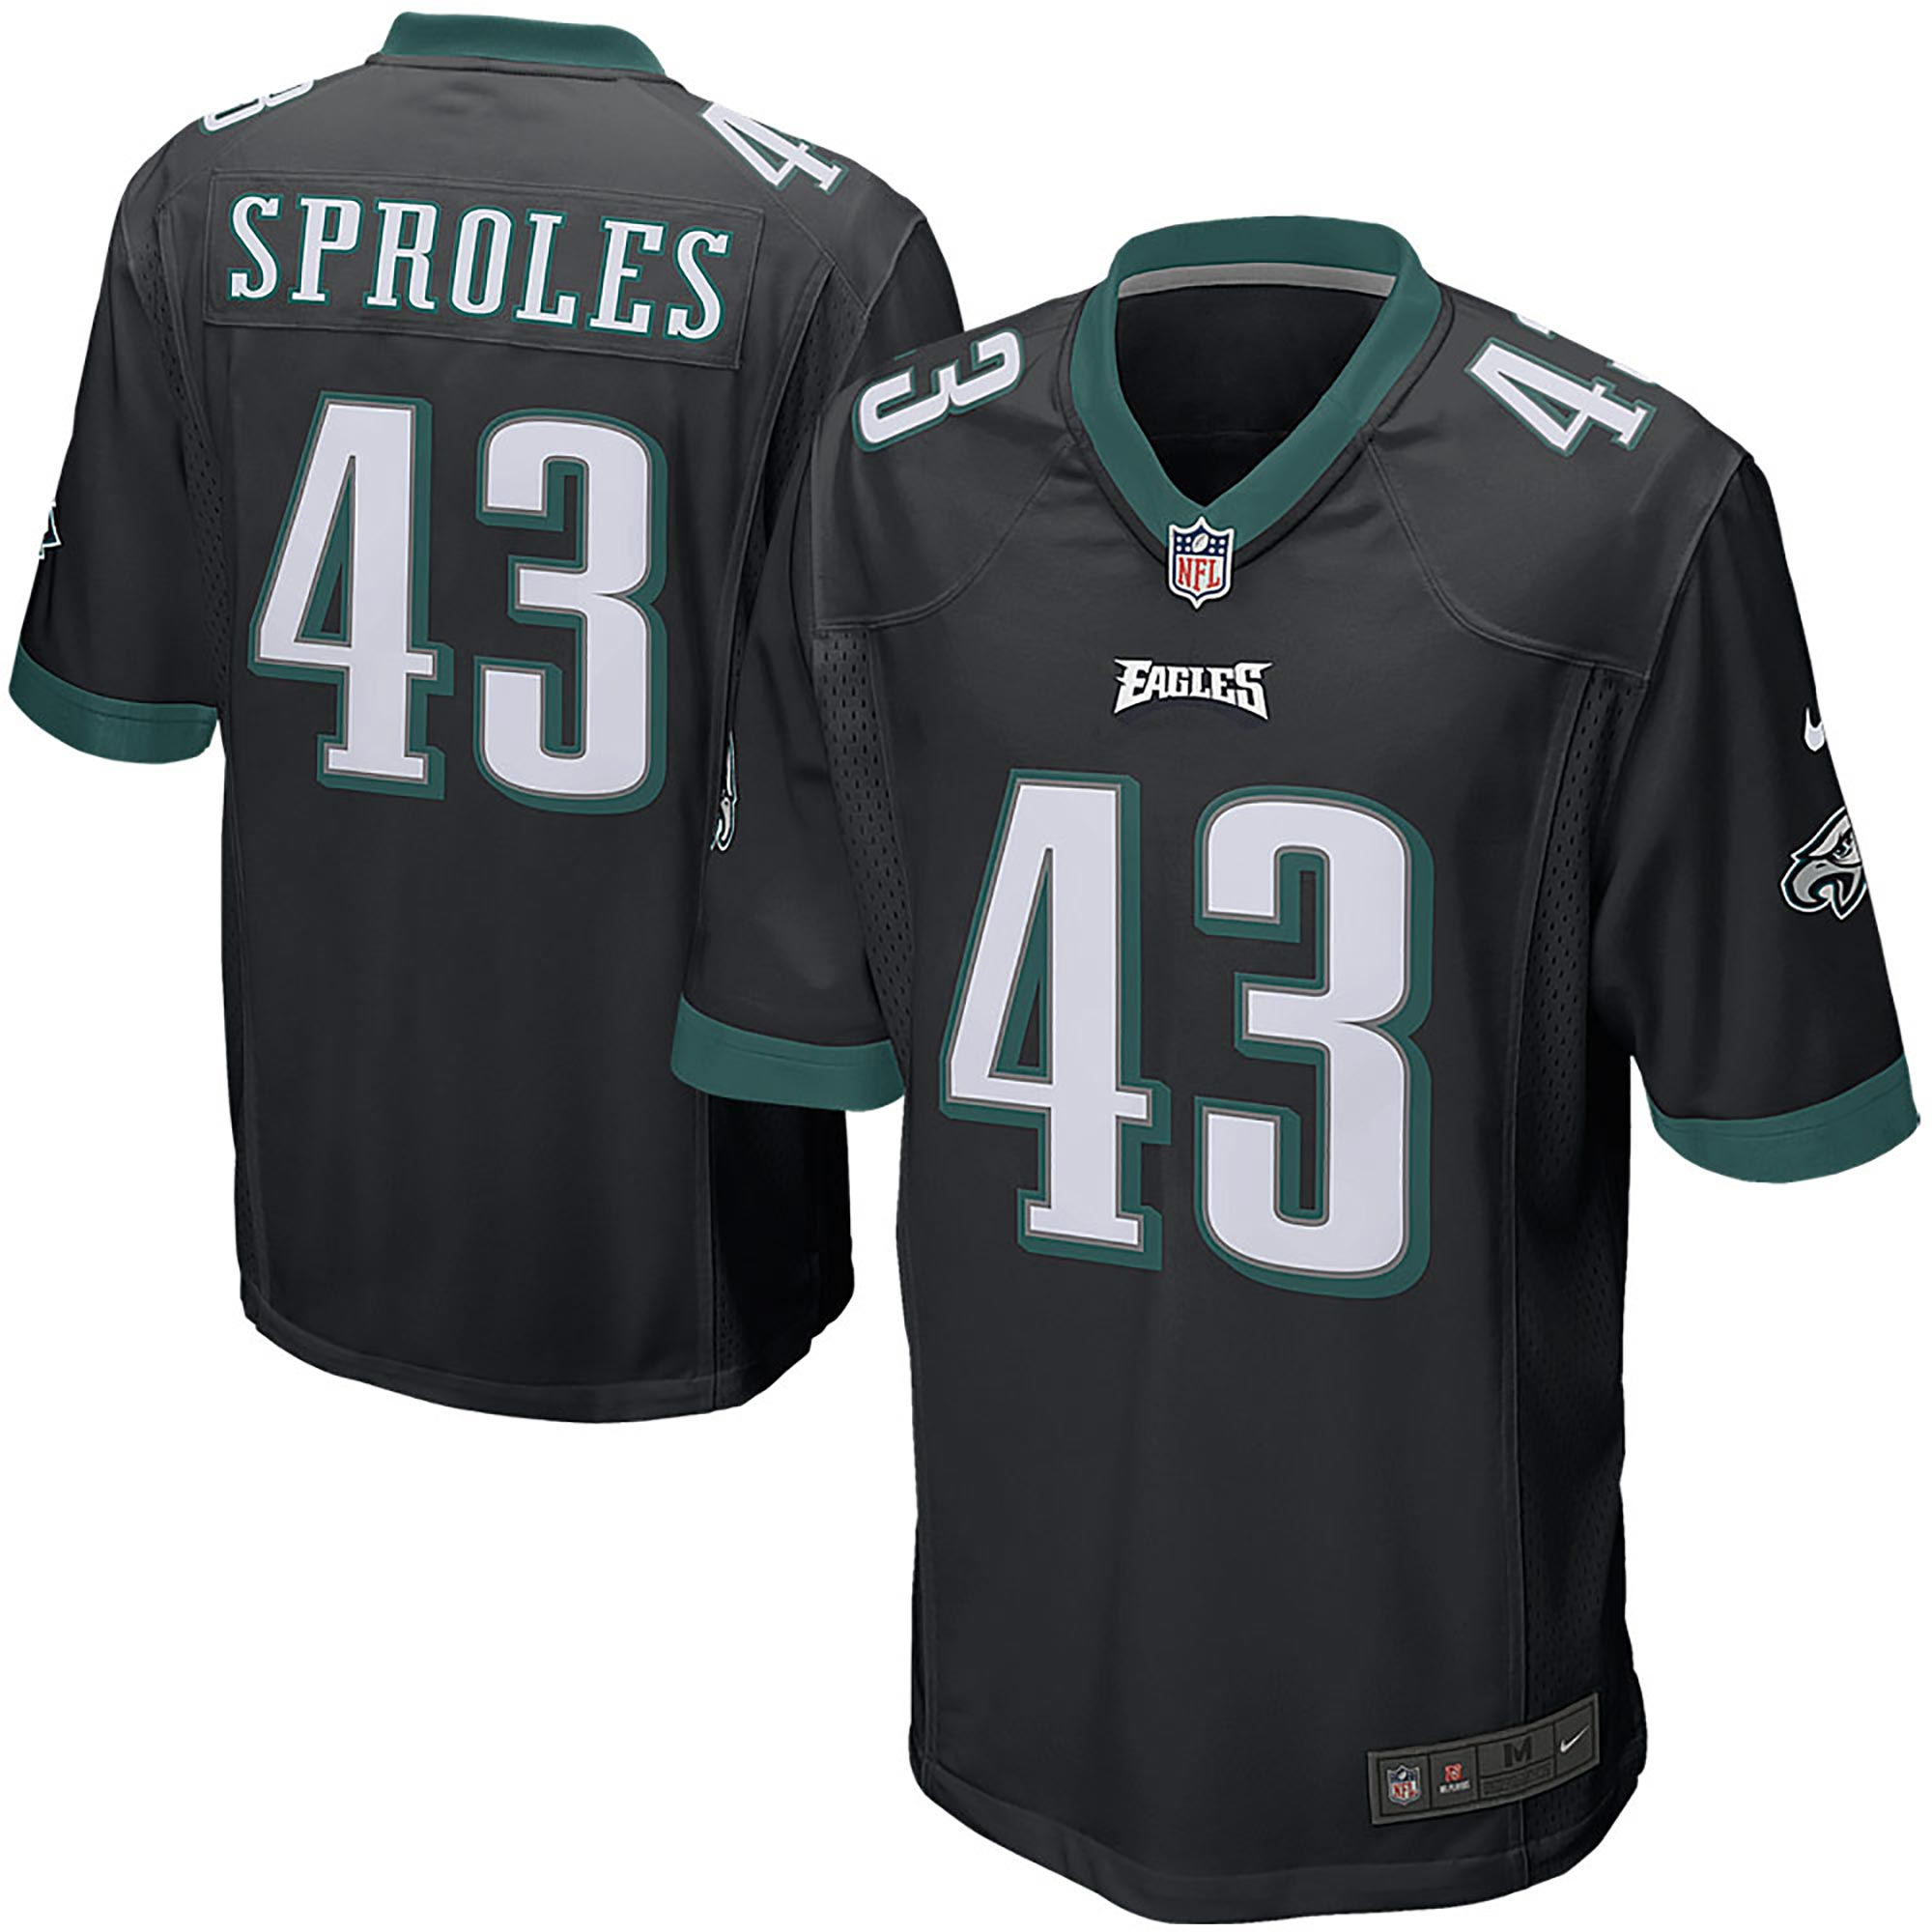 Philadelphia Eagles Ausweichtrikot - Darren Sproles - Jugendliche